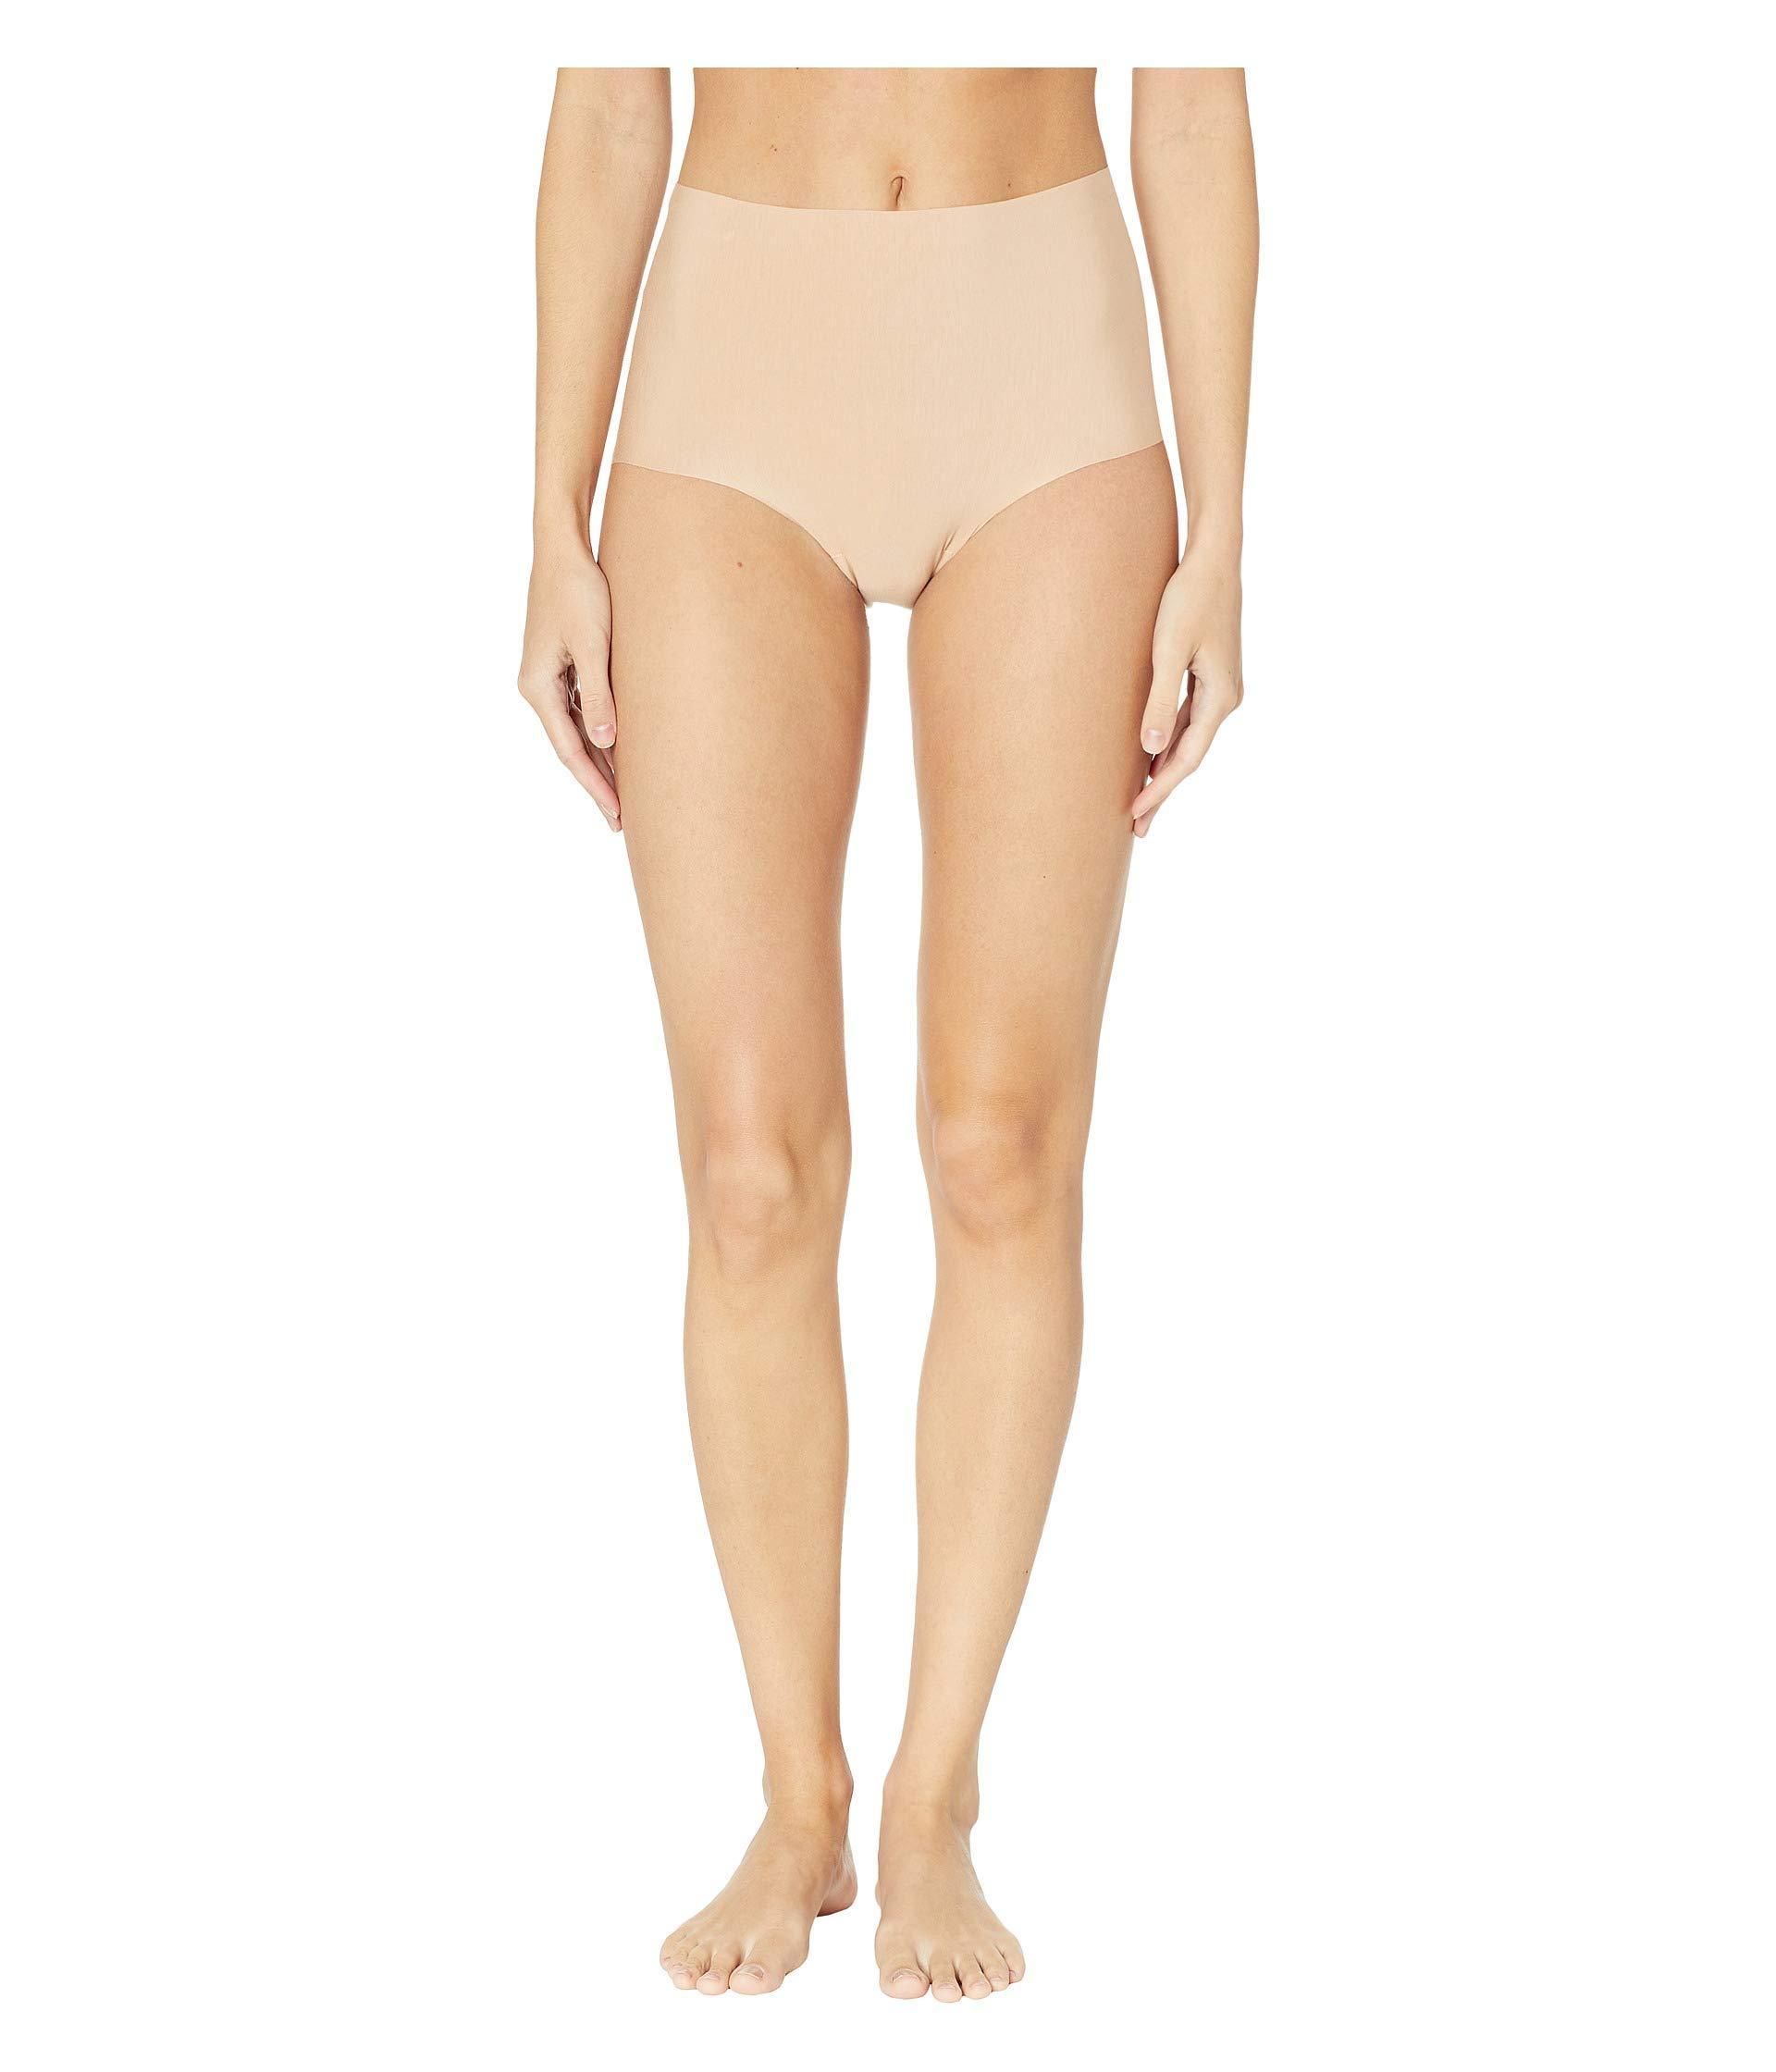 bb109f7be67094 Lyst - Commando Butter High-rise Panty Hrp04 (beige) Women s ...